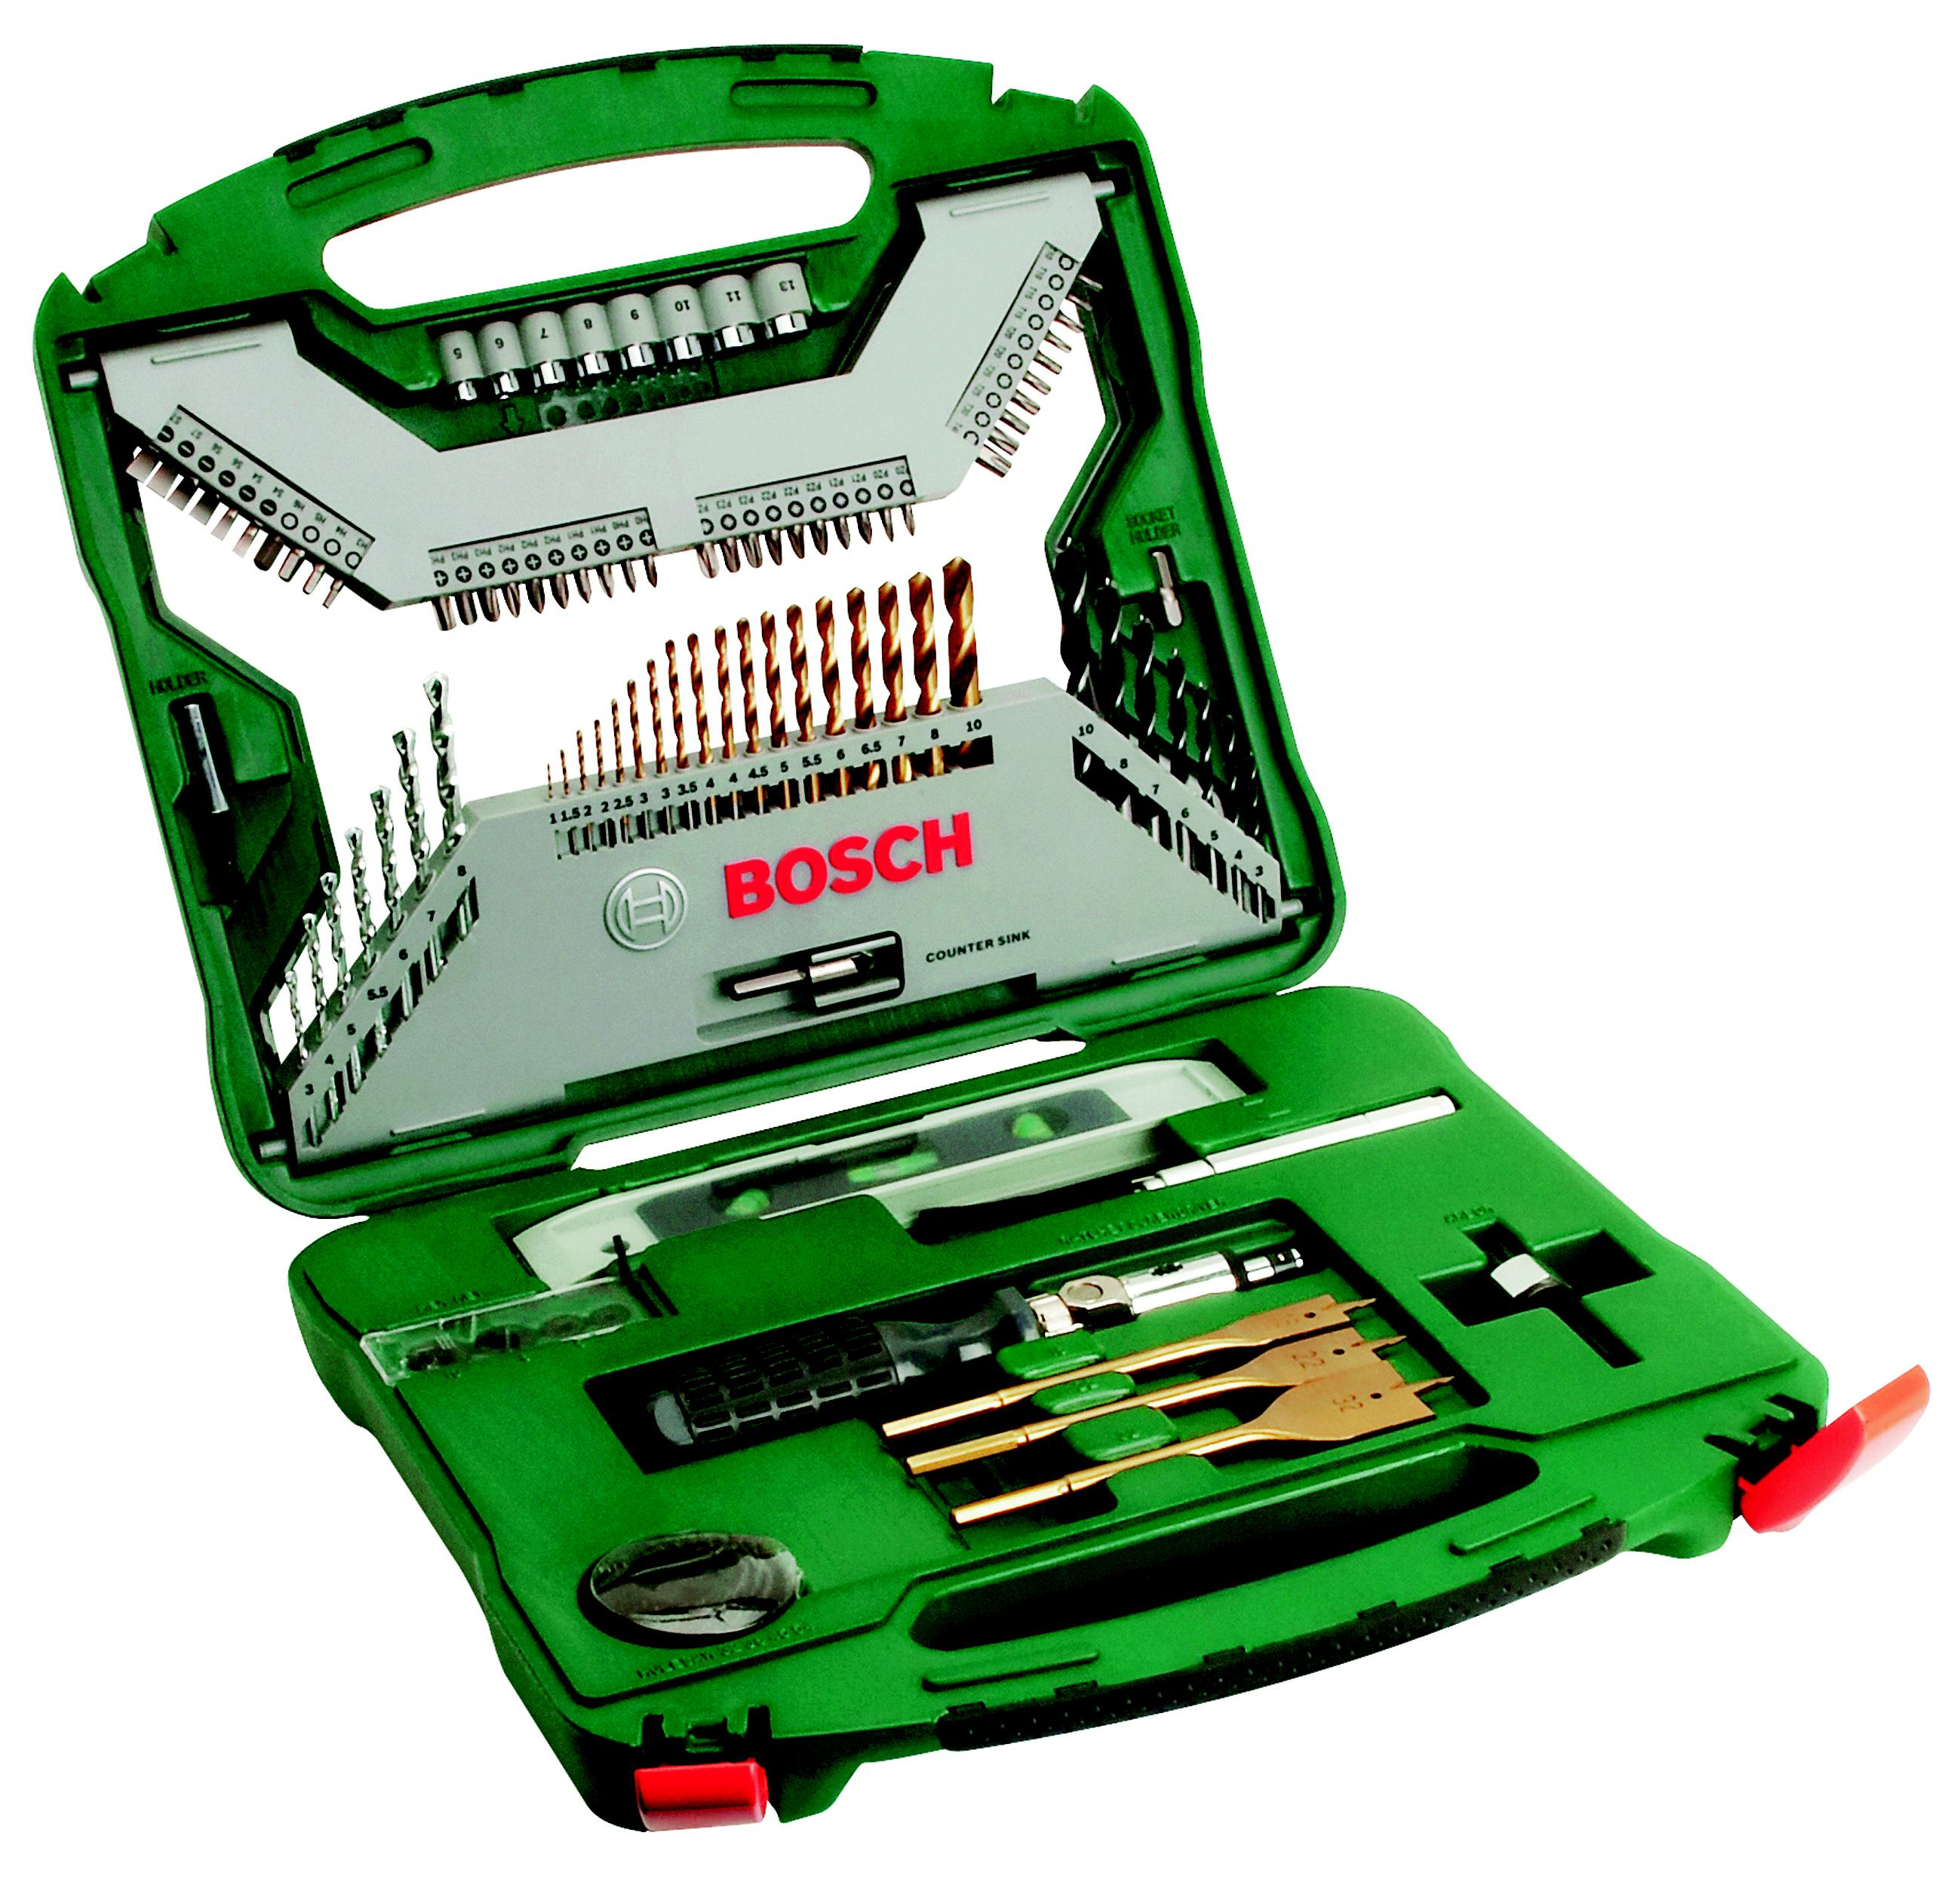 Набор бит и сверл Bosch X-line 100 titanium (2.607.019.330) набор сверл bosch x line 100 100 предметов 2607019330